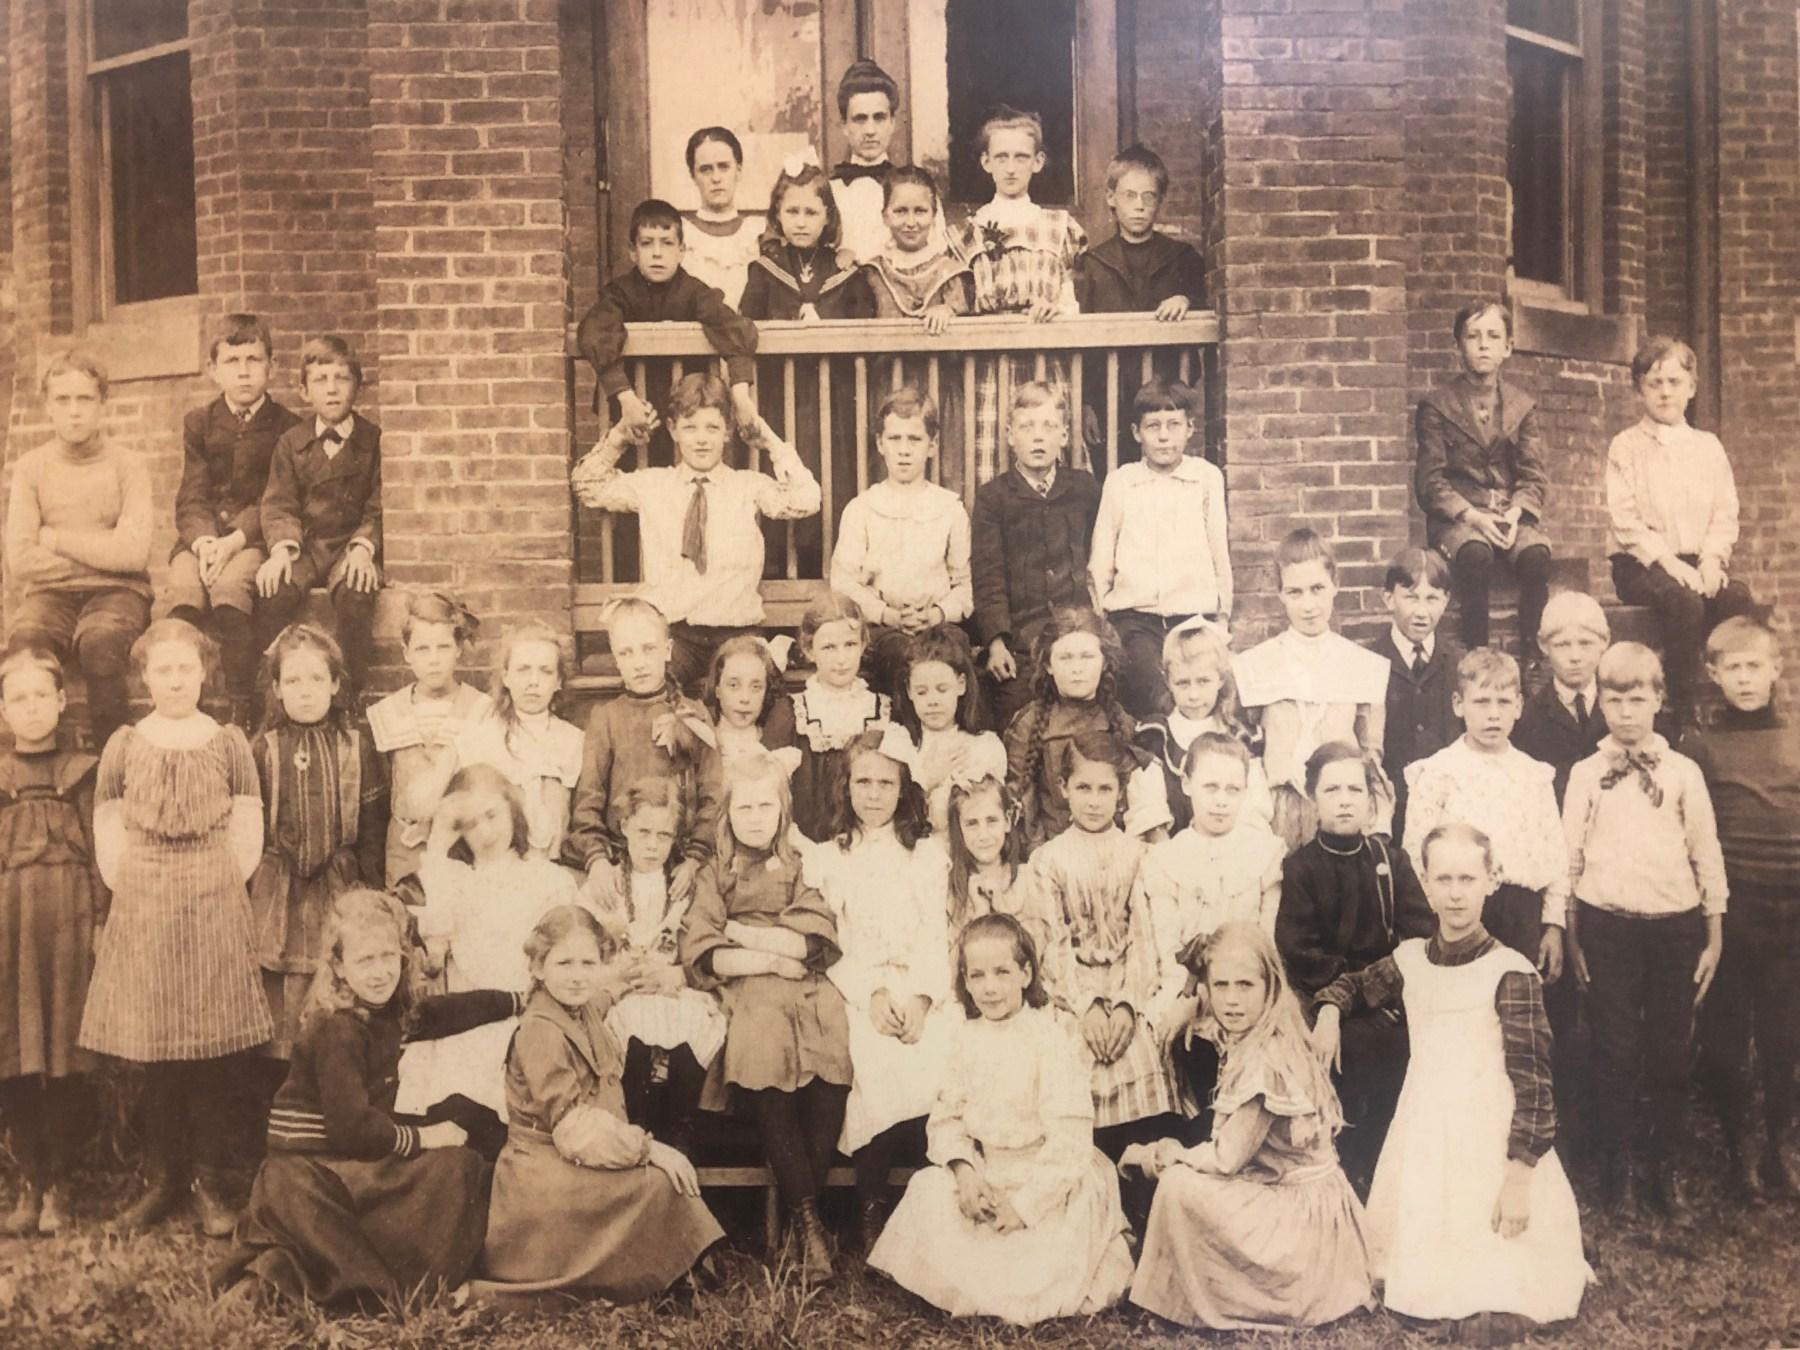 Wyman School group, 1895